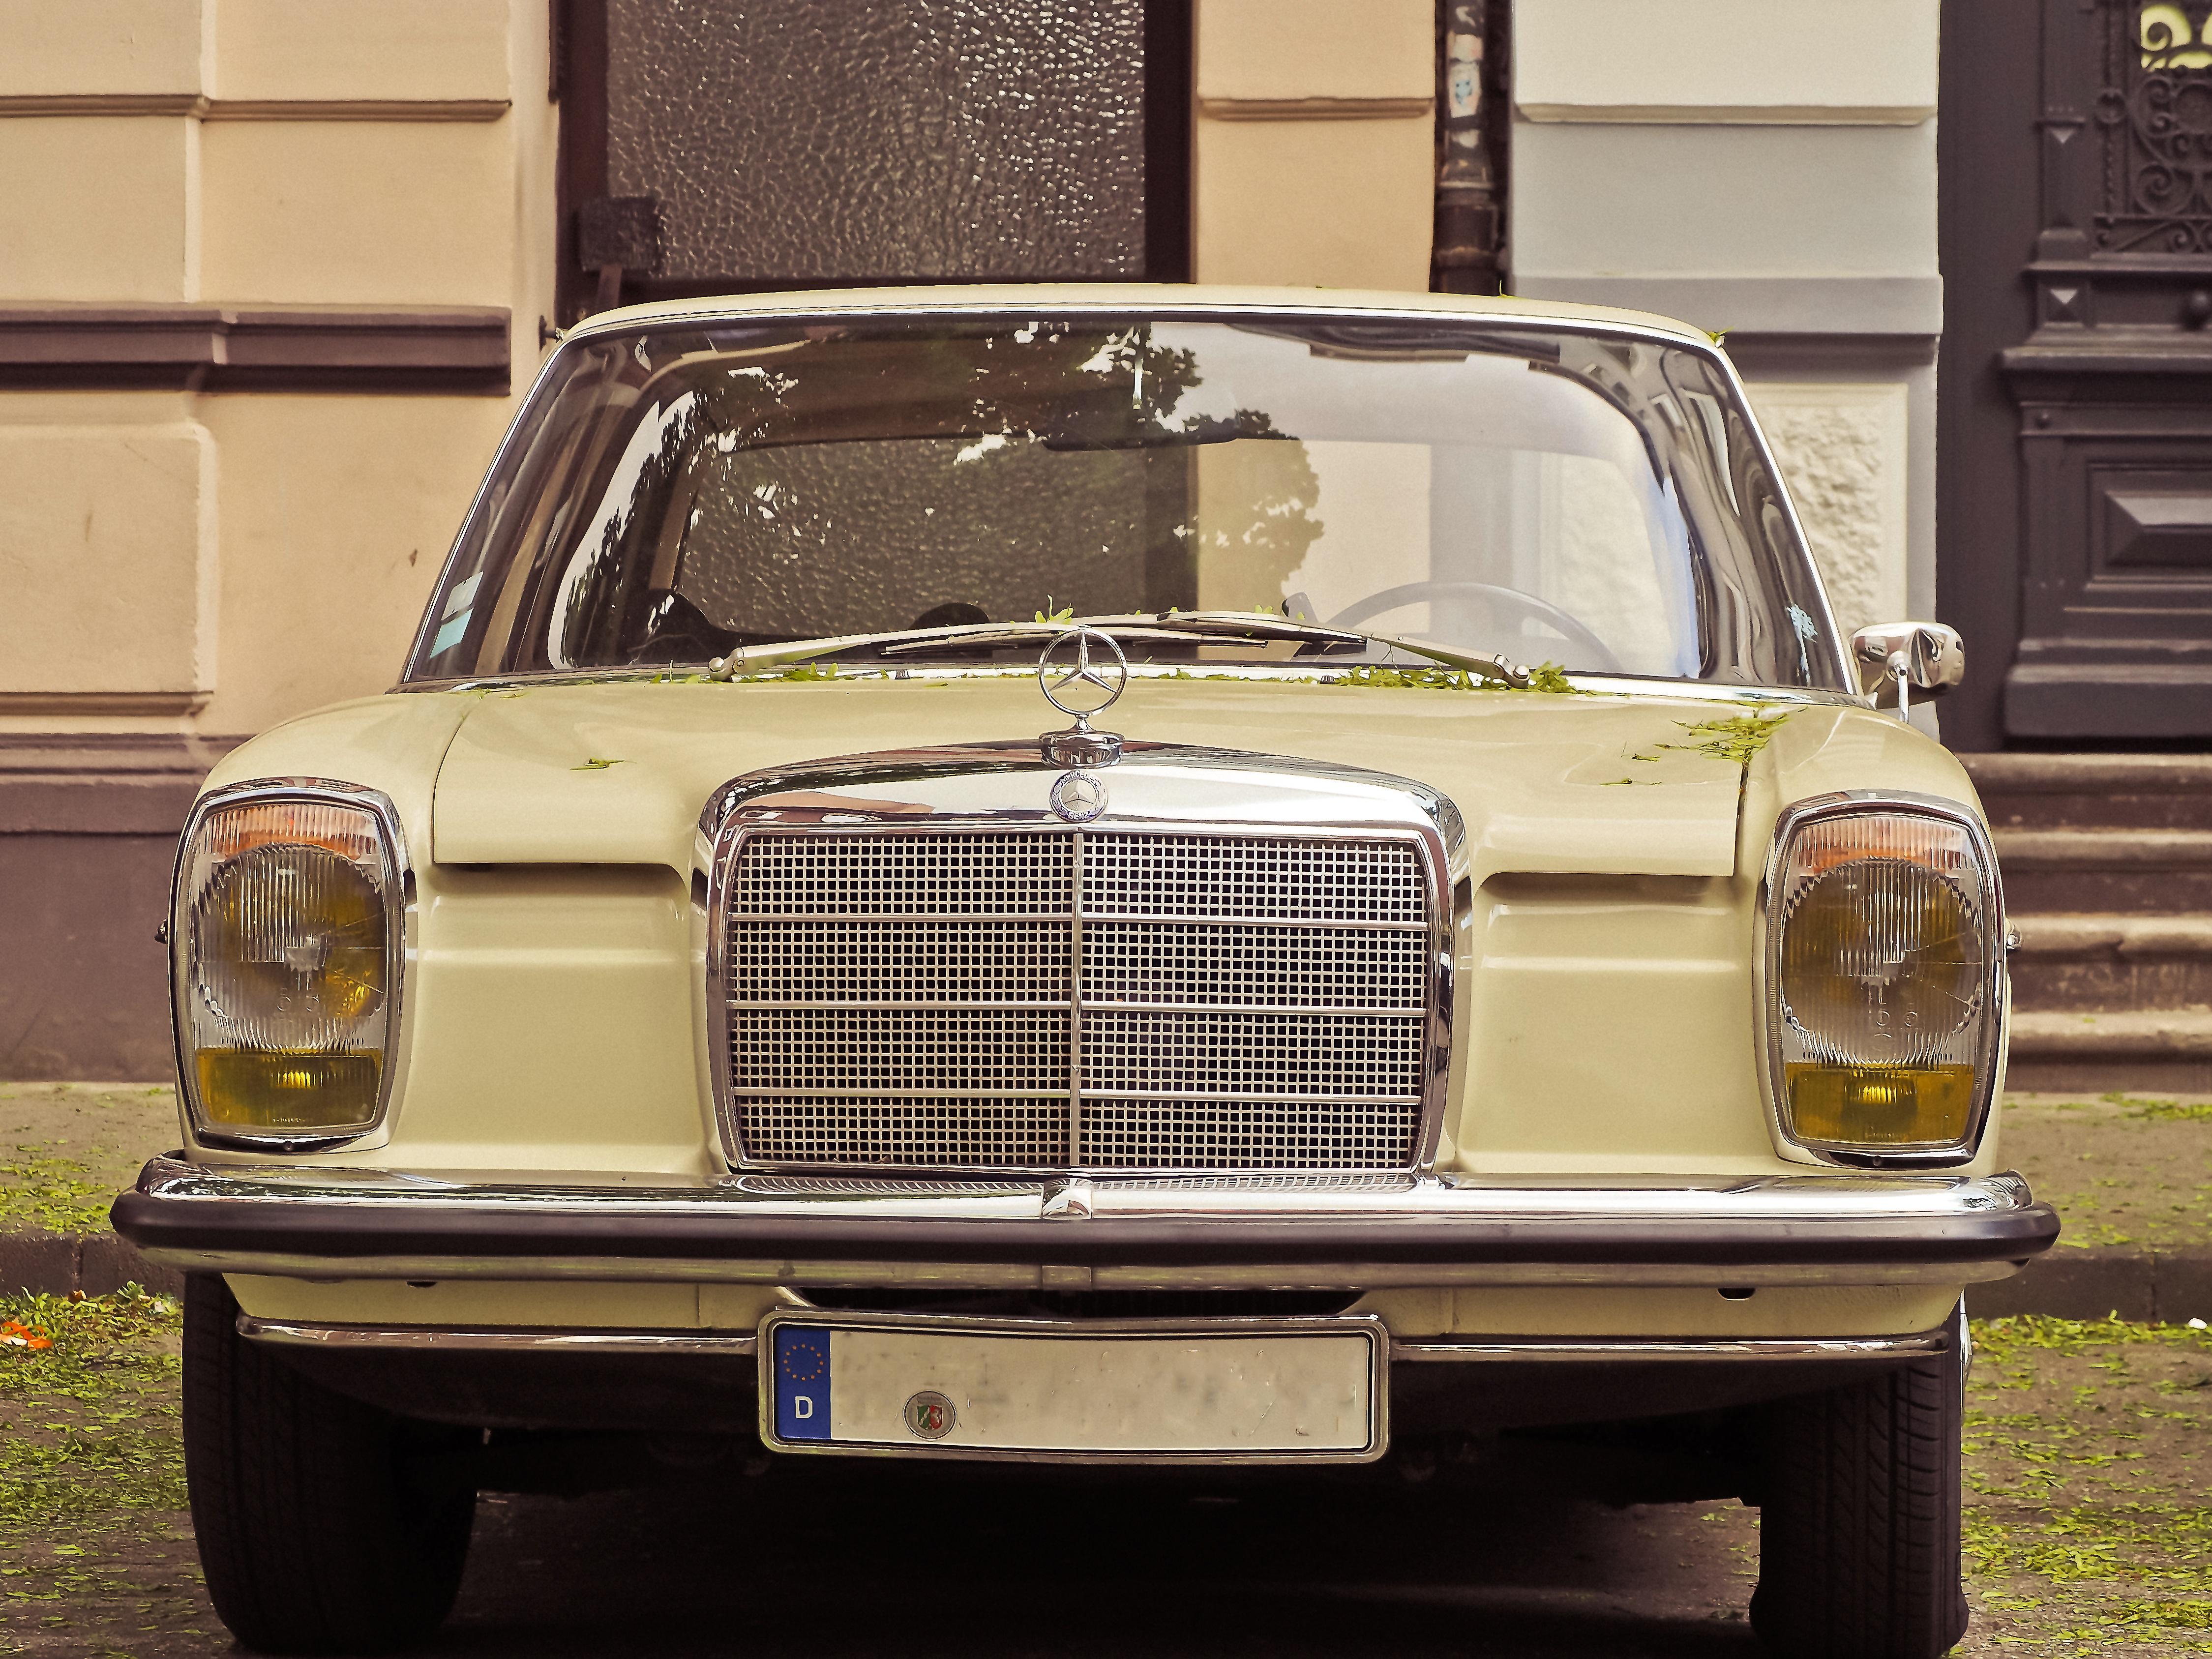 Free Images : road, retro, old, urban, auto, nostalgia, classic ...